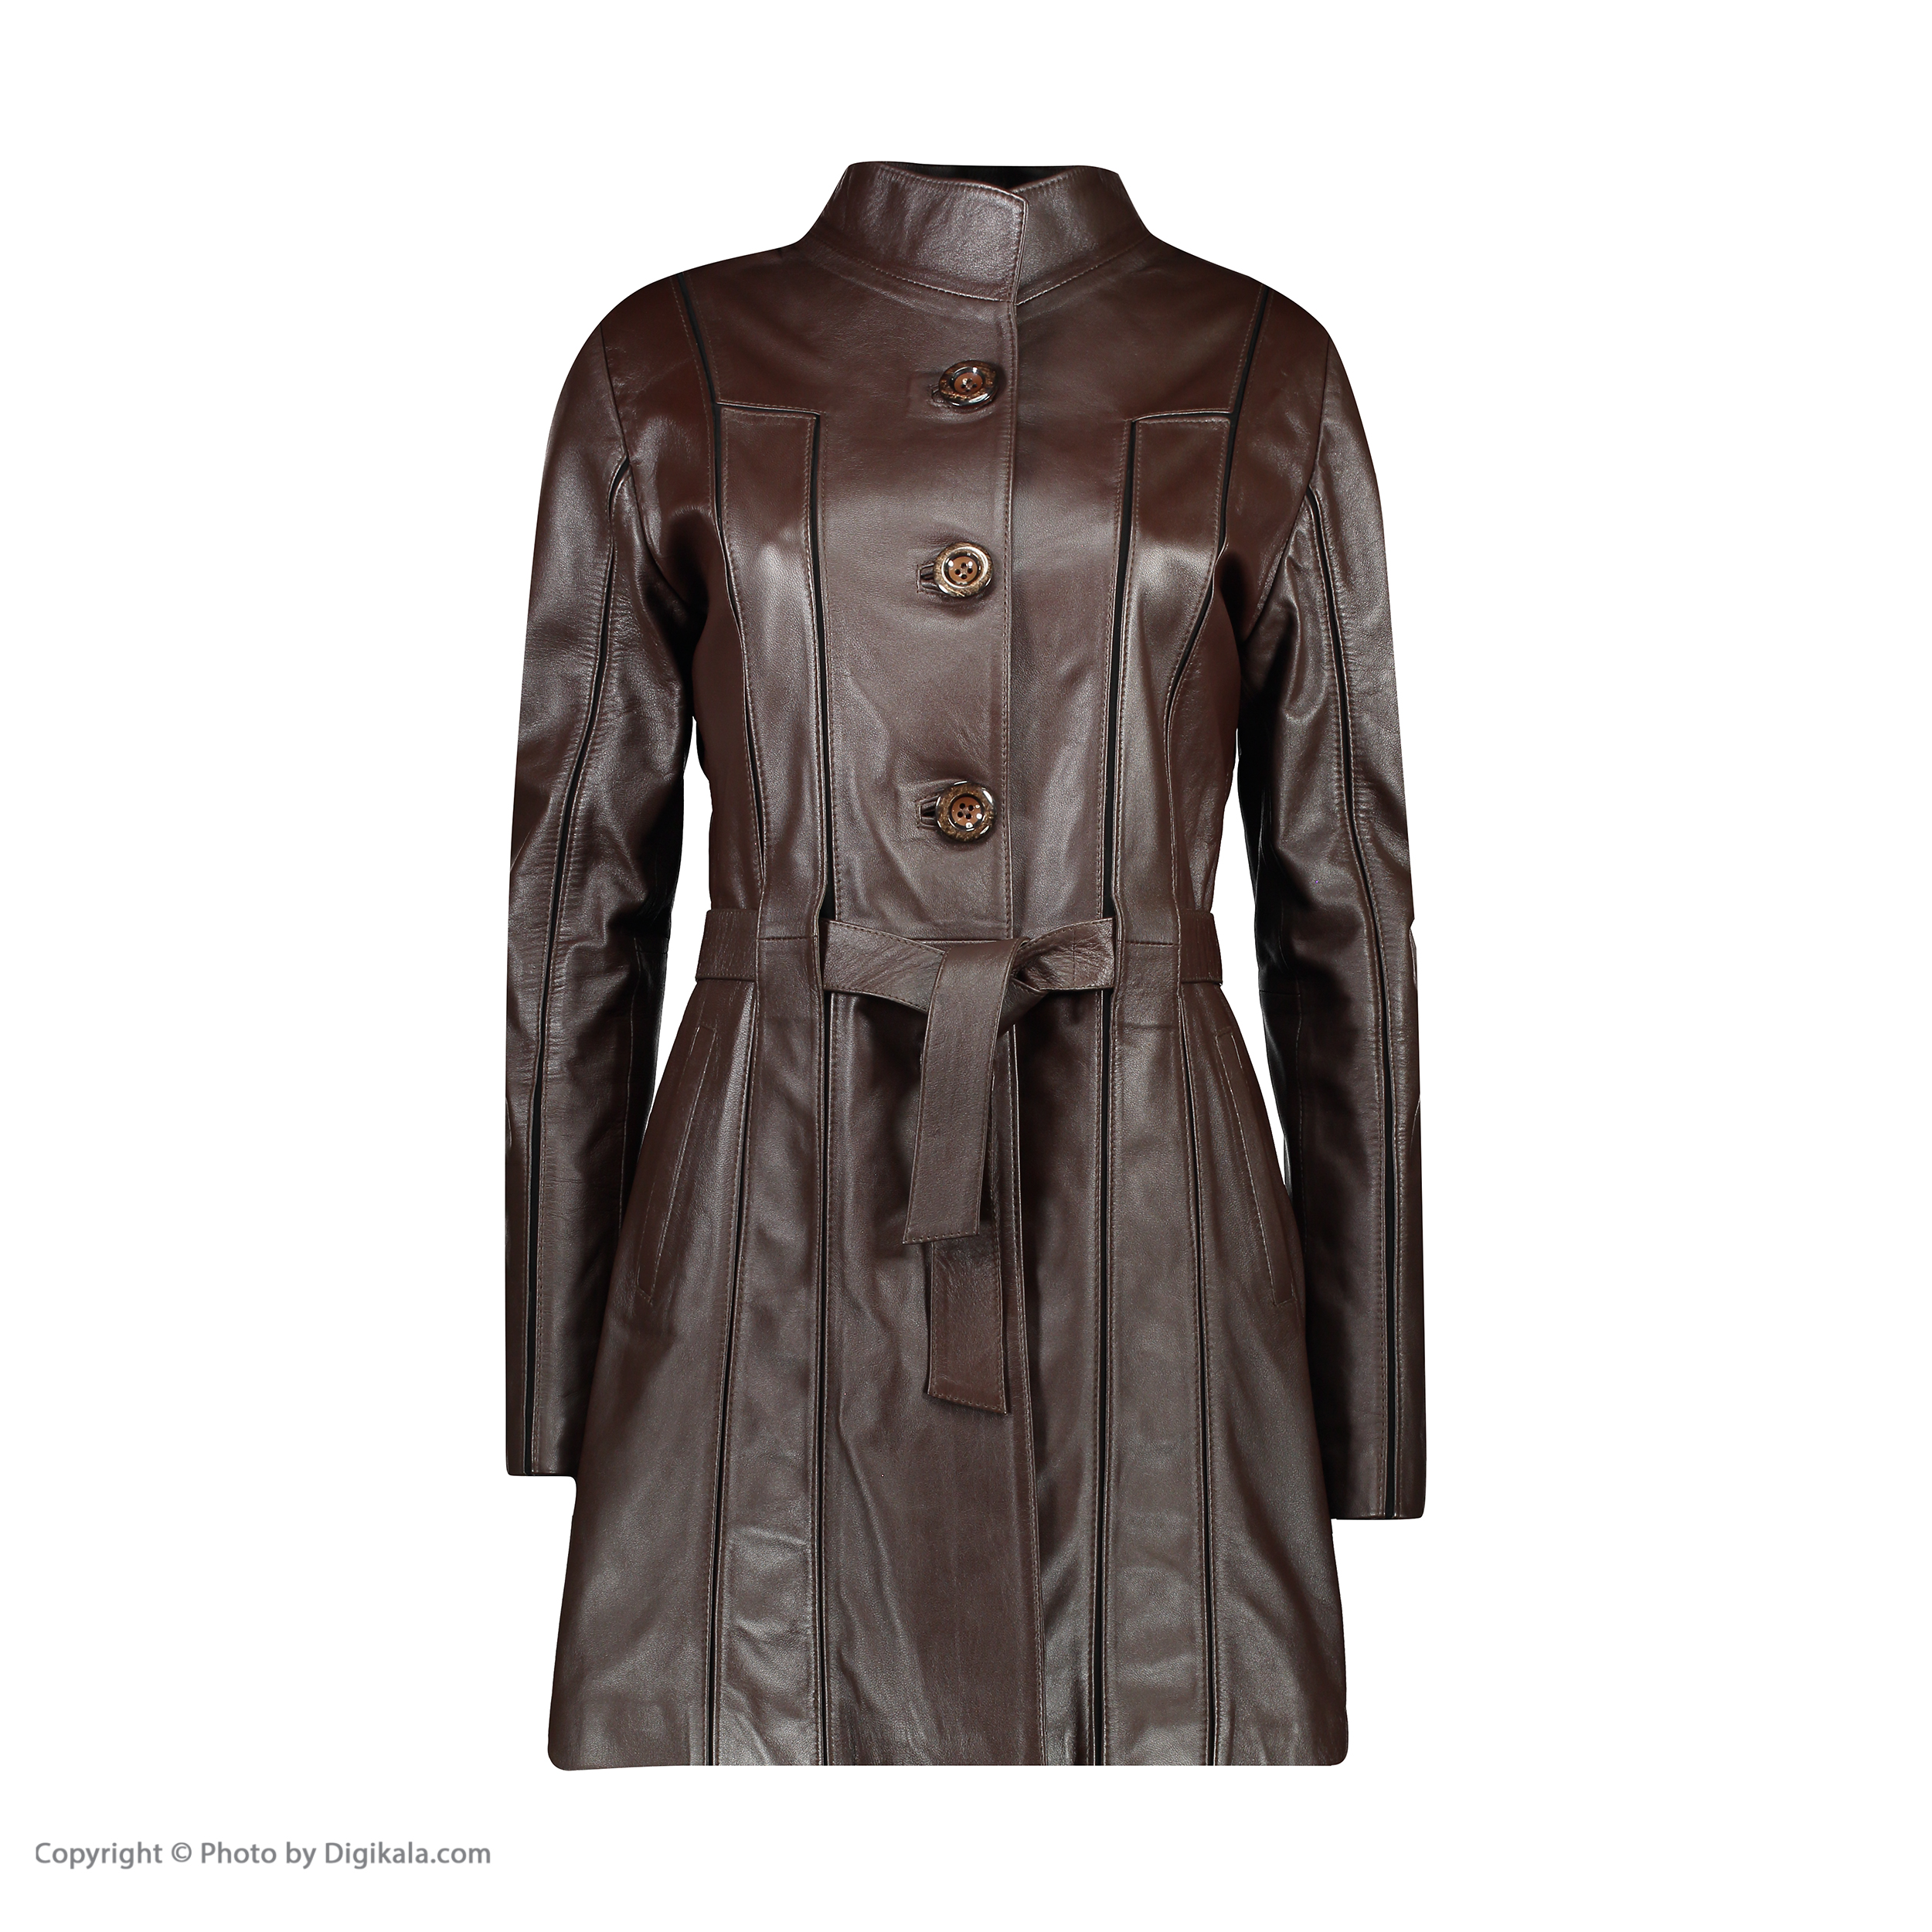 SHIFER WOMEN NATURAL LEATHER RAINCOAT, MODEL 7W51-2